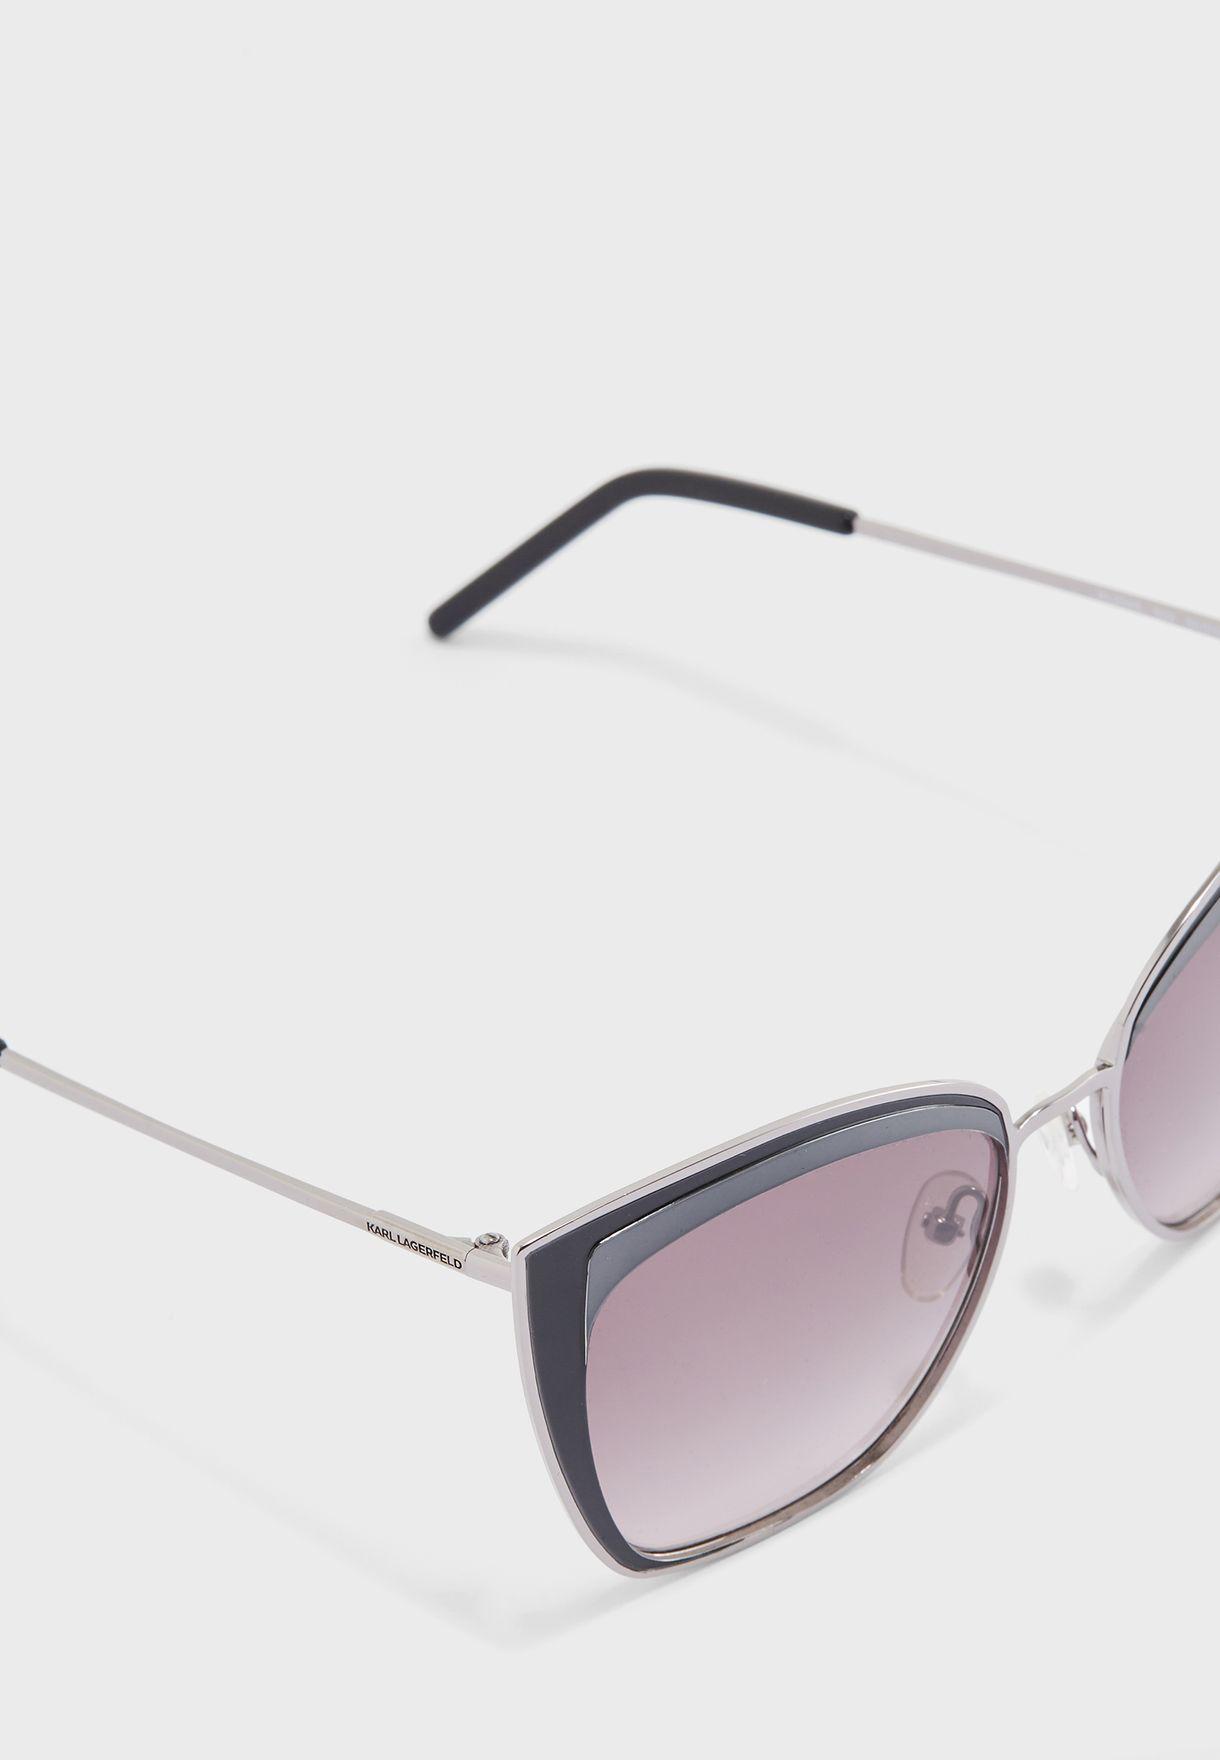 KL254S Butterfly Sunglasses